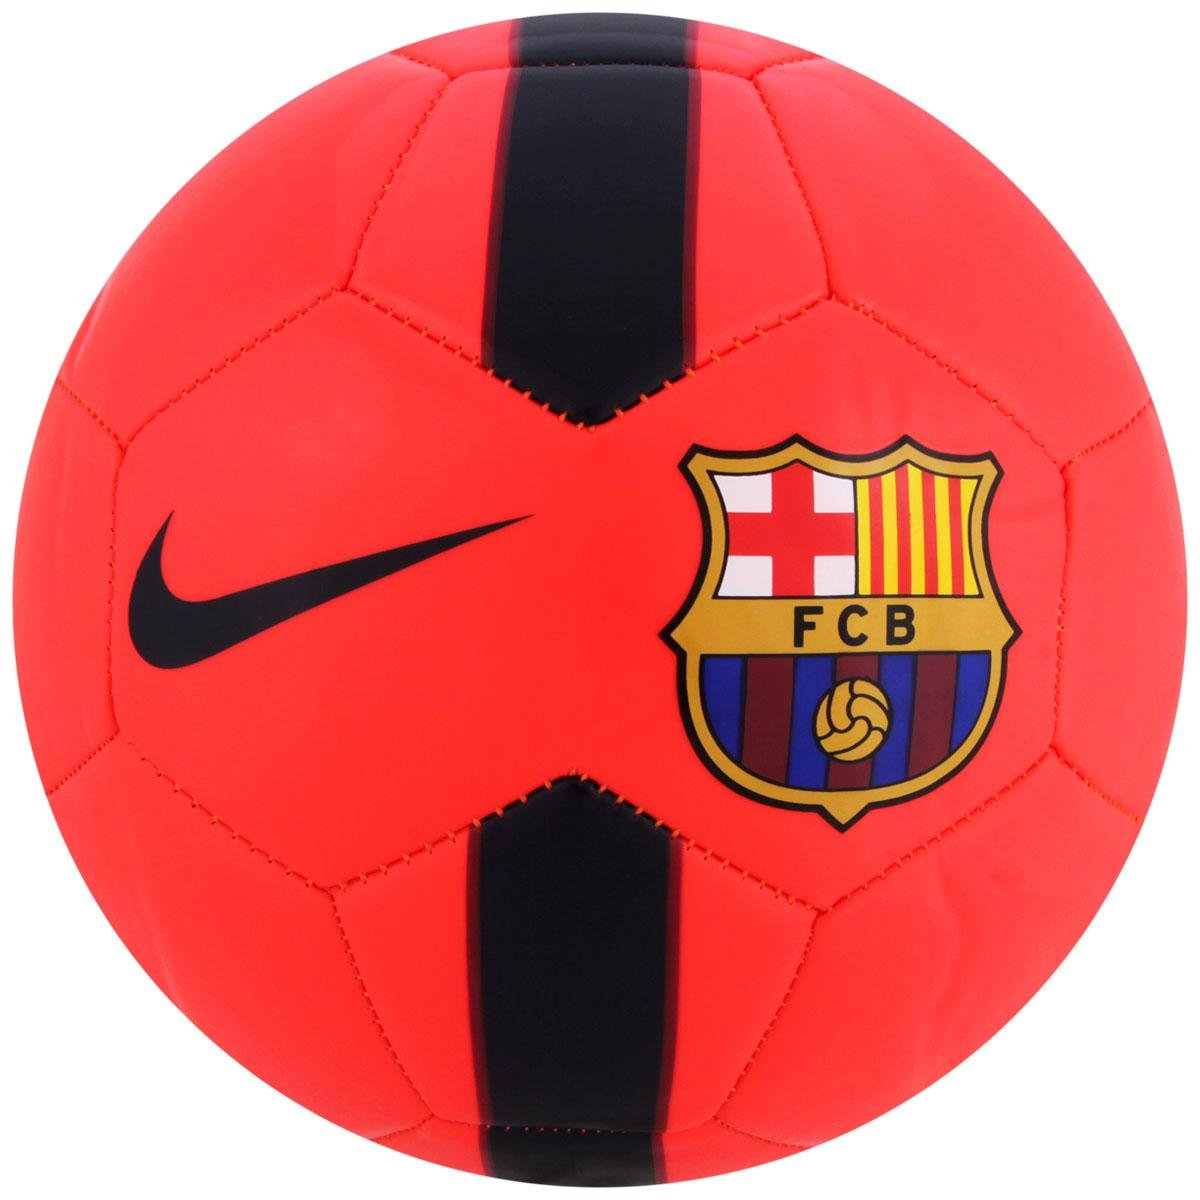 Bola Futebol Nike Barcelona Supporter s Campo - Compre Agora  df4c354272a27